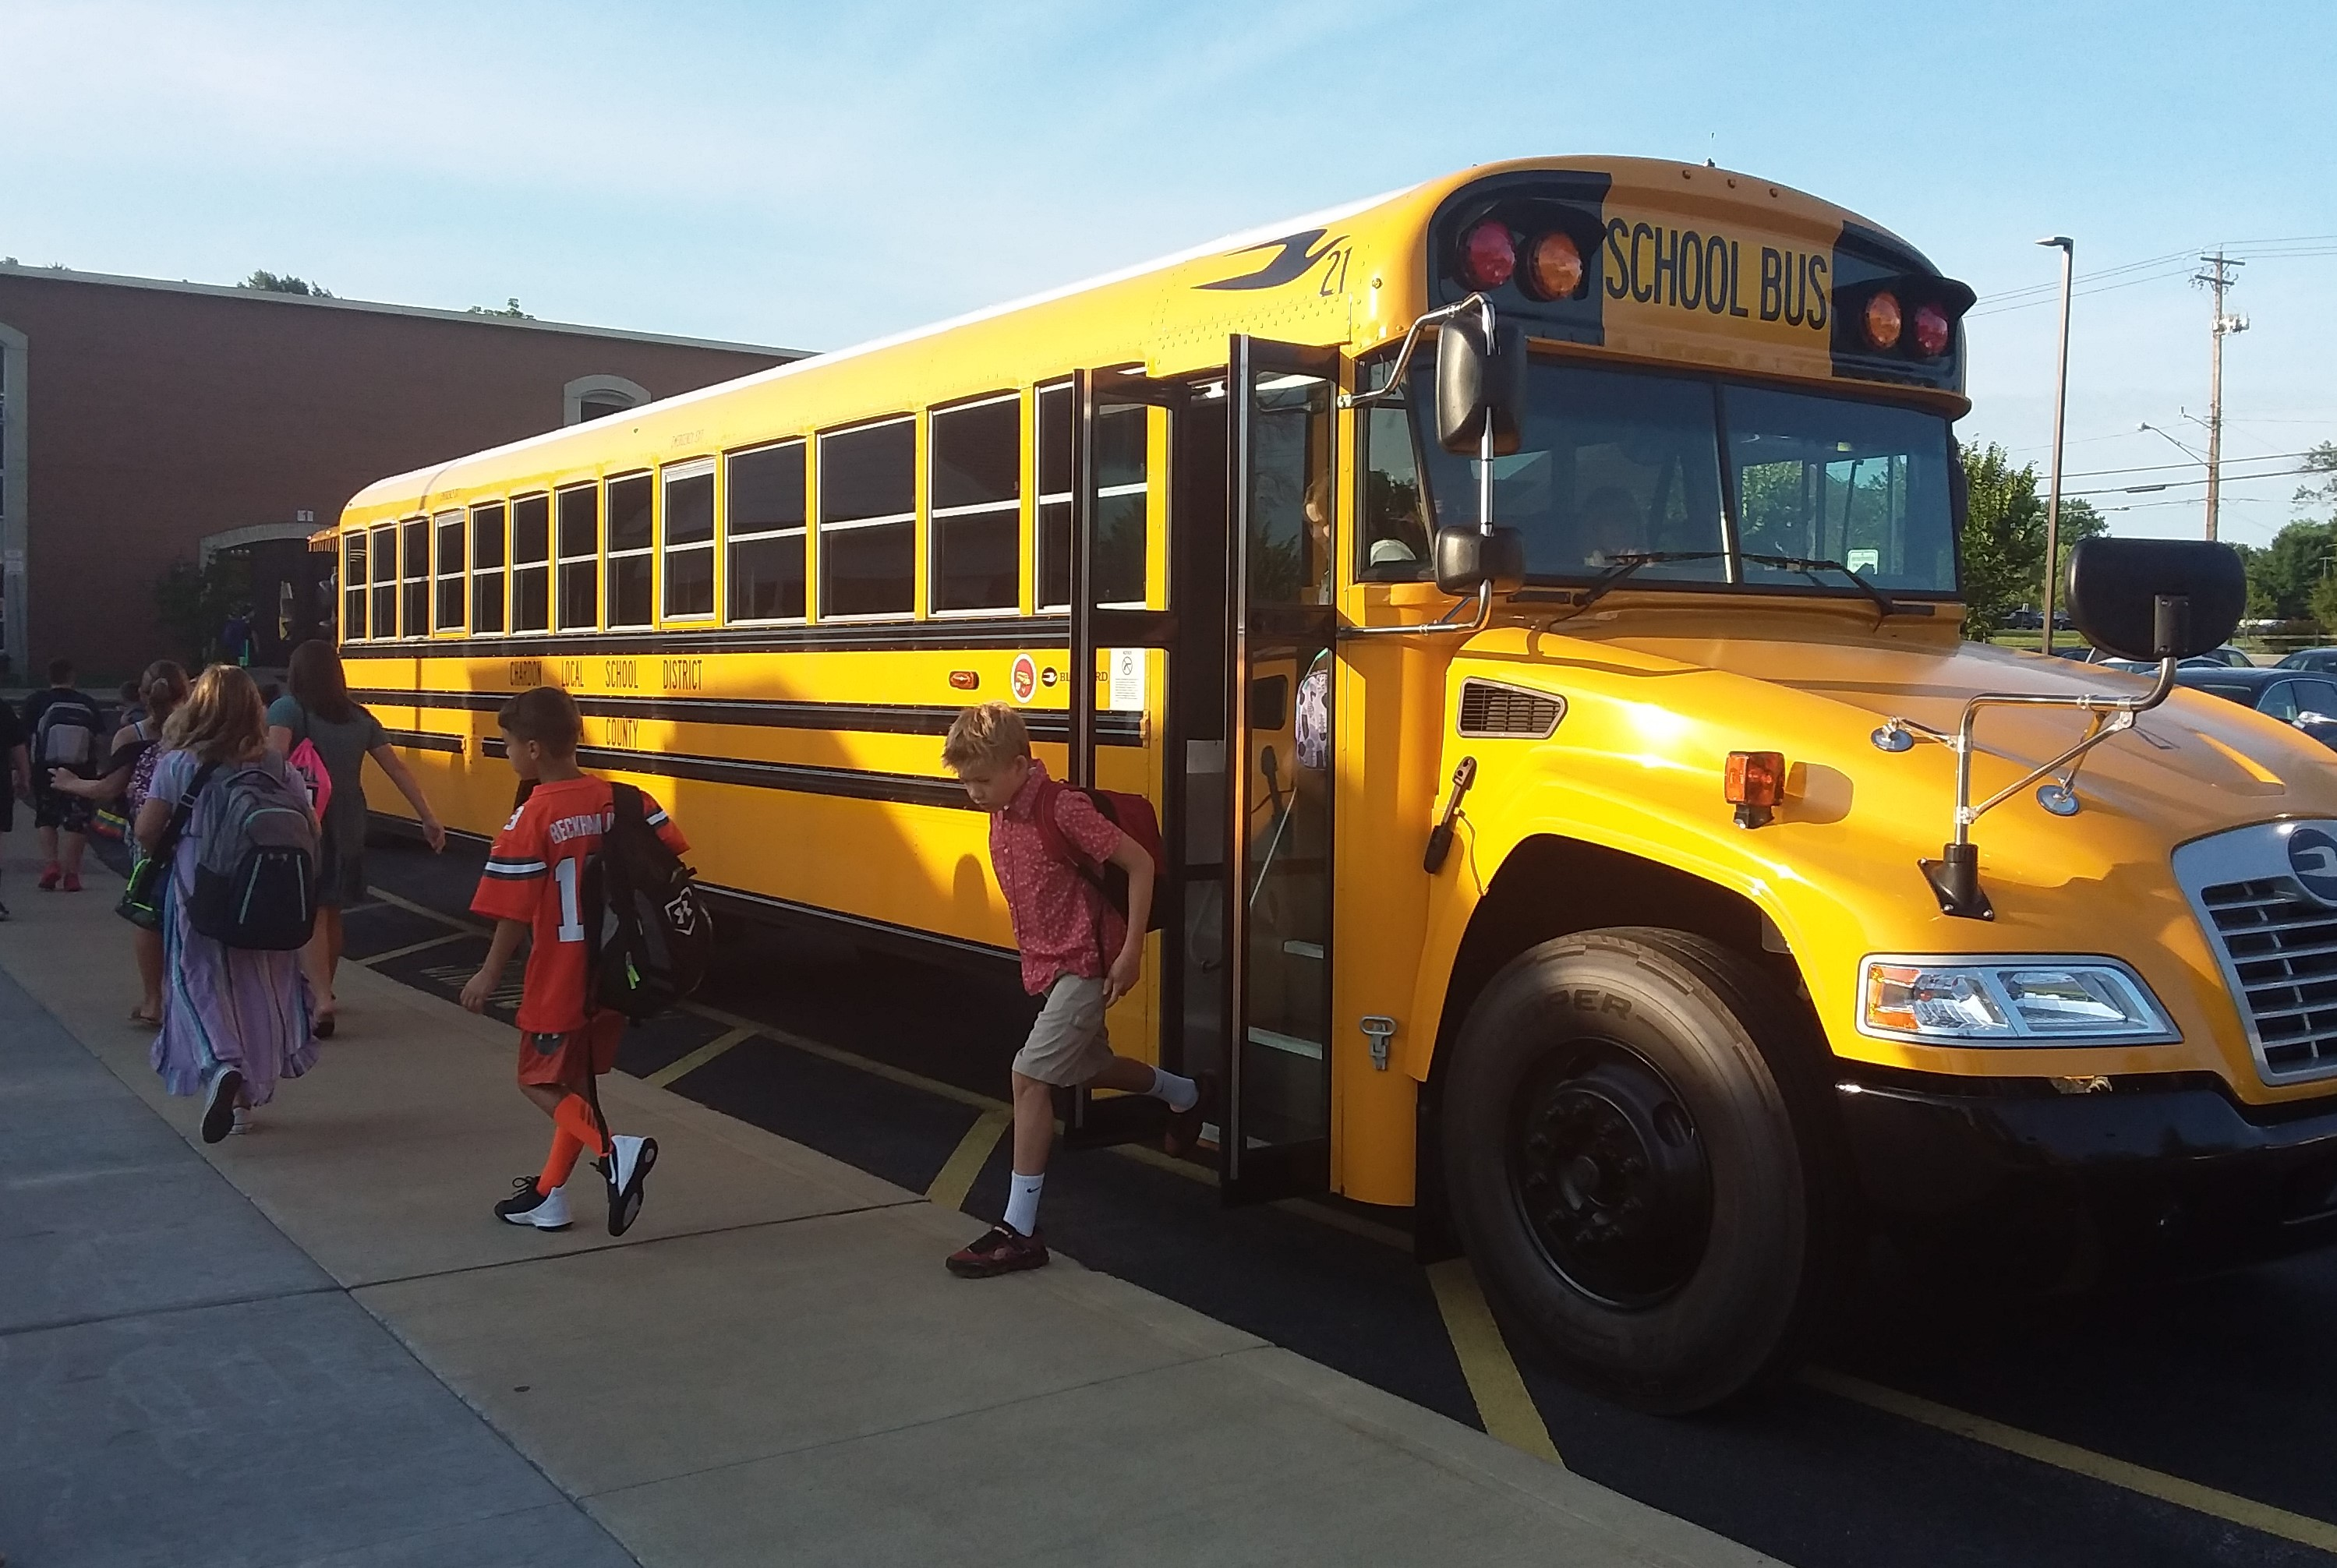 Chardon Schools students exiting school bus at Chardon Middle School